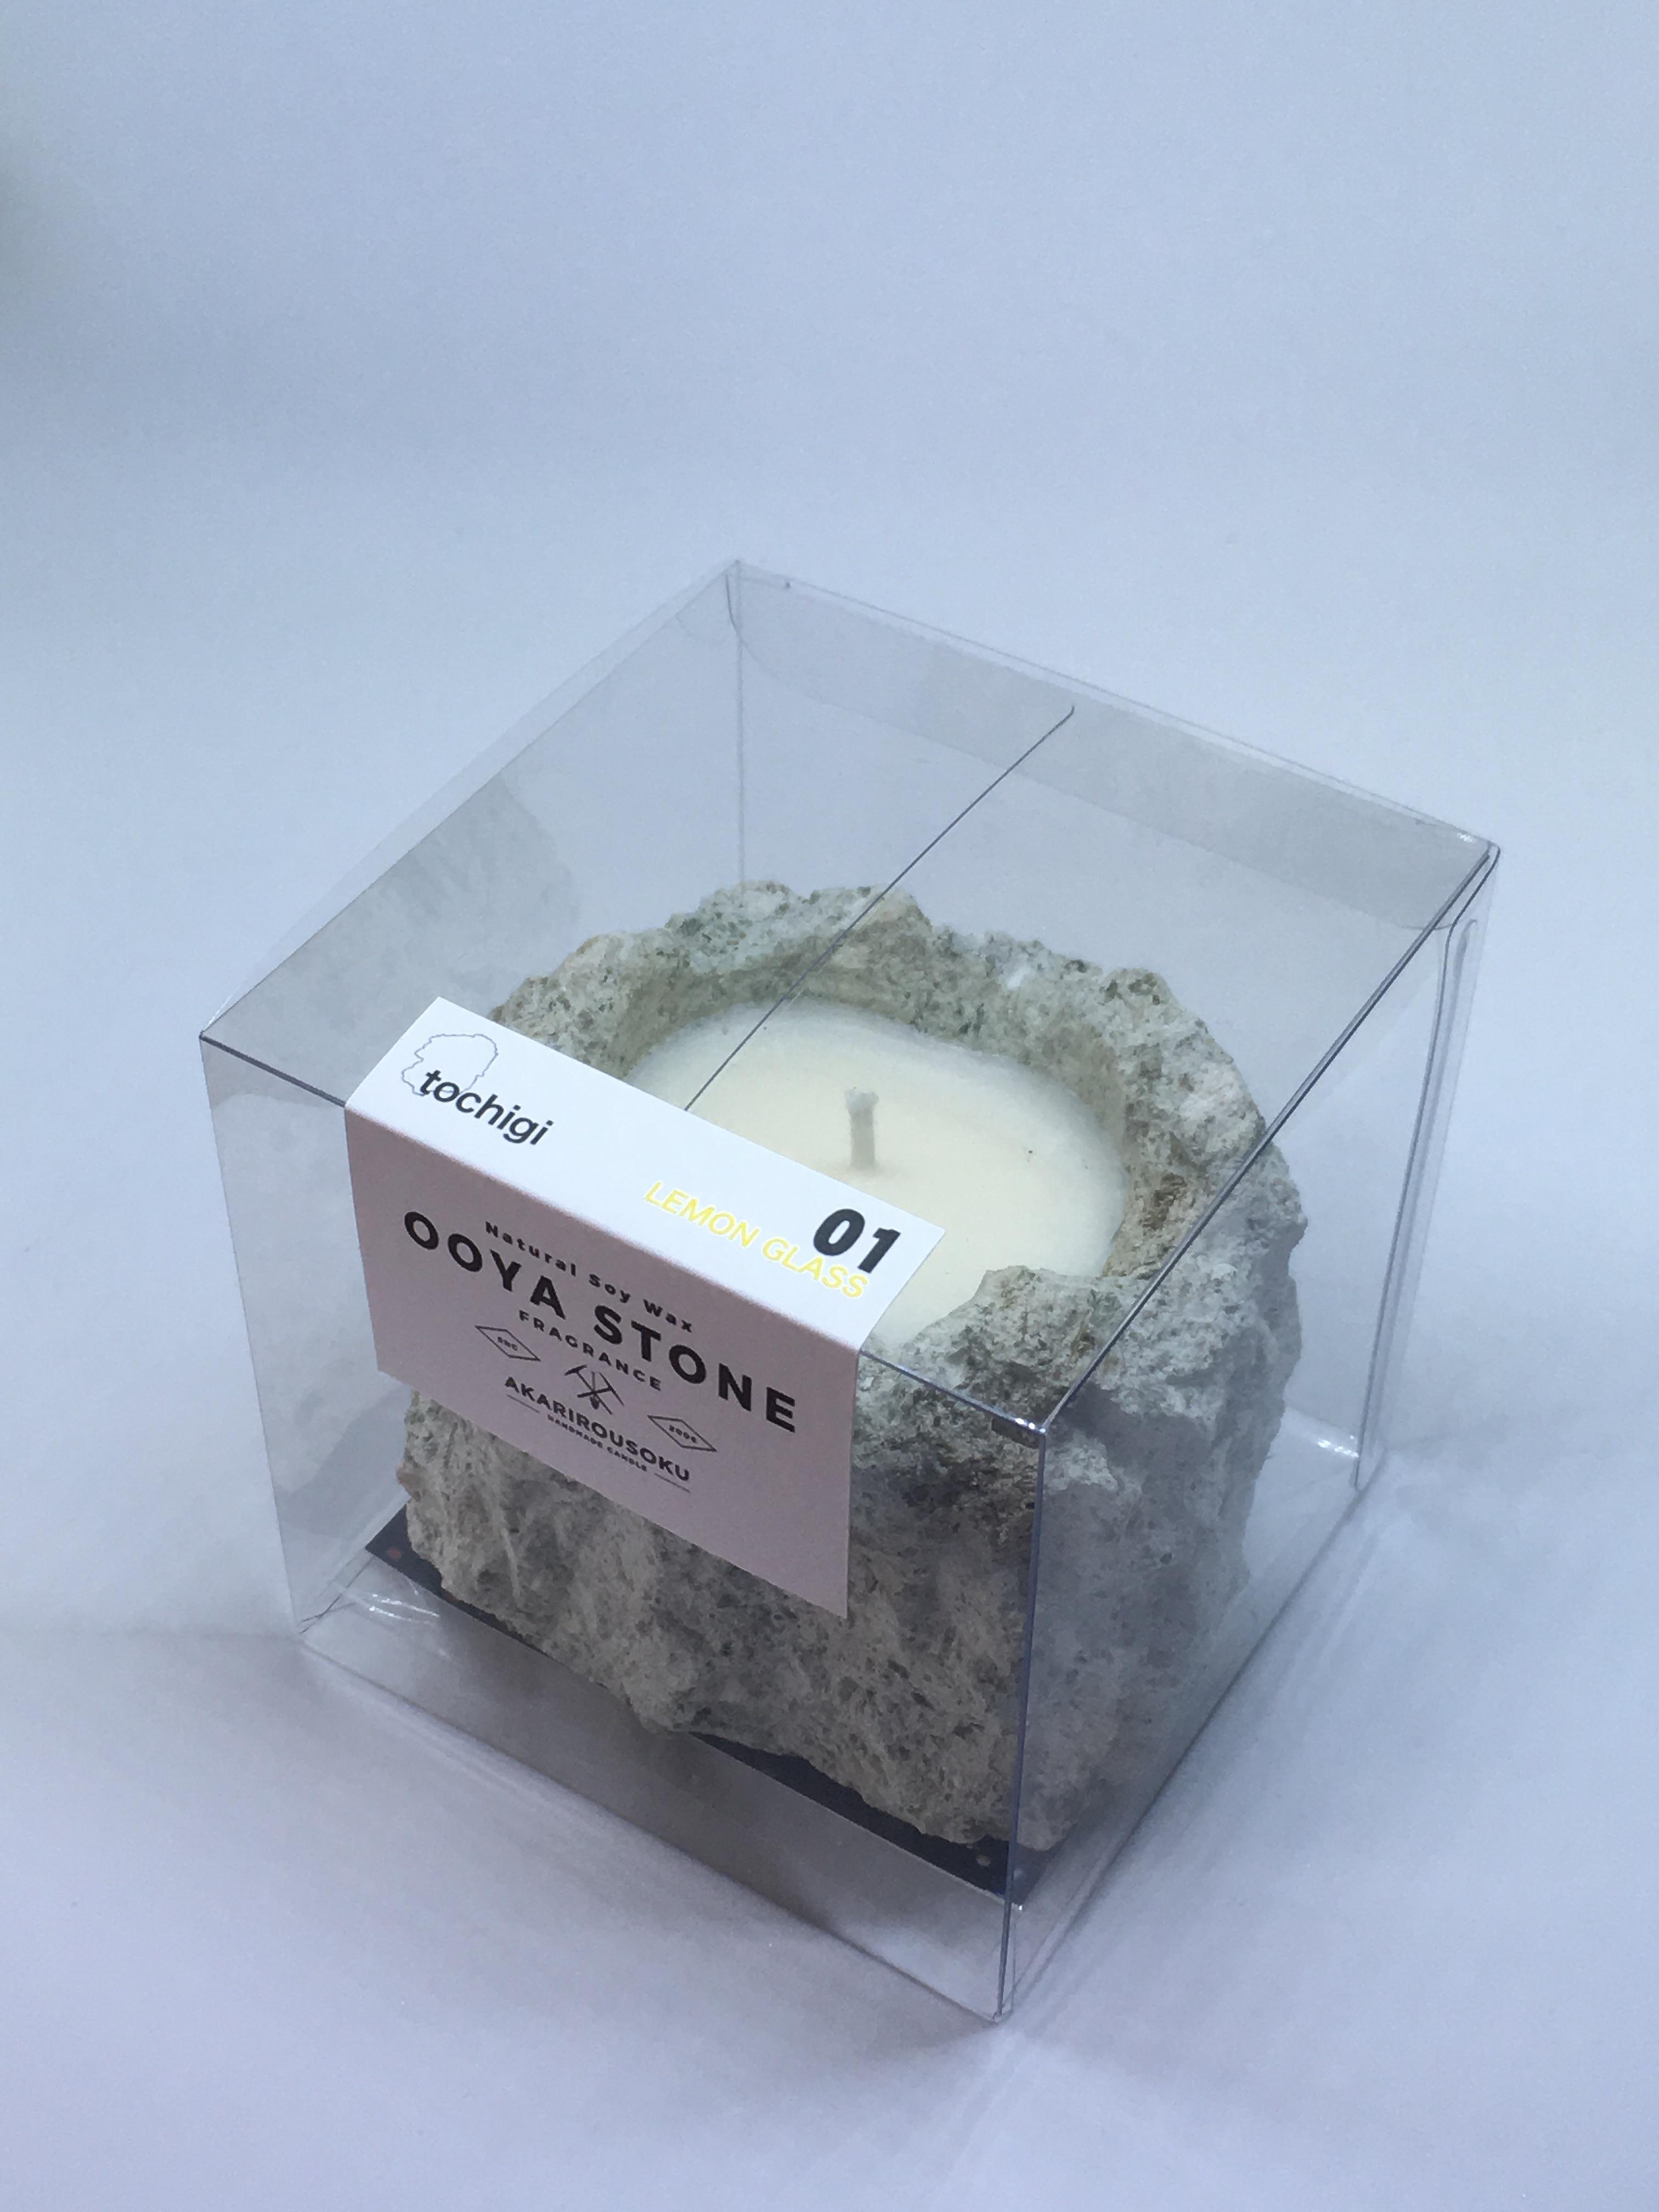 NEW★  OOYA STONE CANDLE (無香料) 2800 大谷石ソイキャンドル 天然石